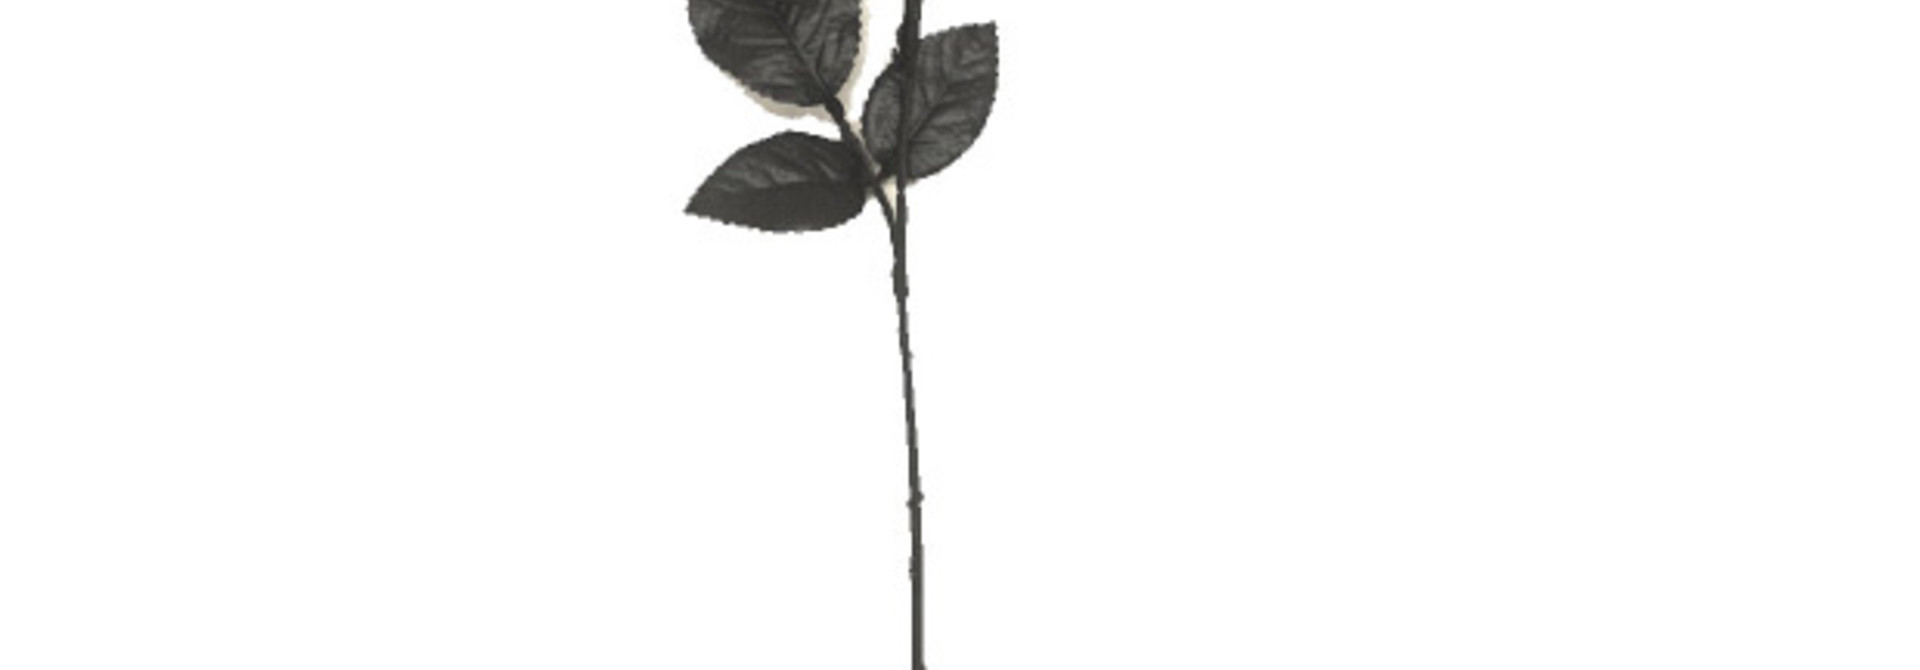 Black Rose creep it real